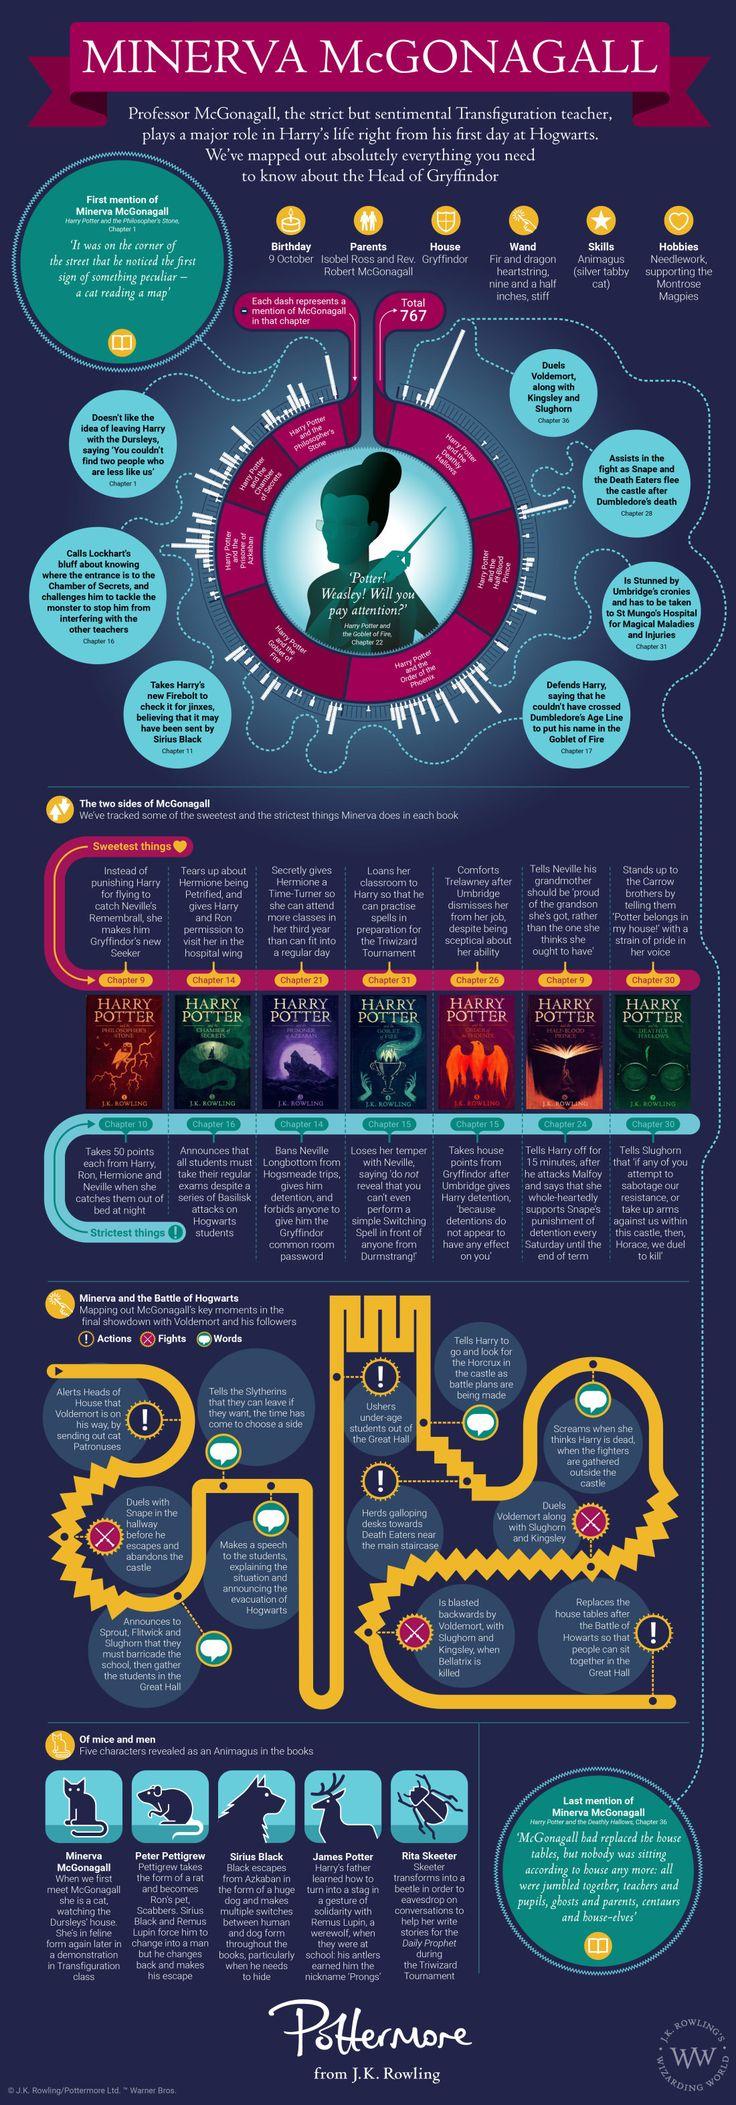 Minerva McGonagall infographic